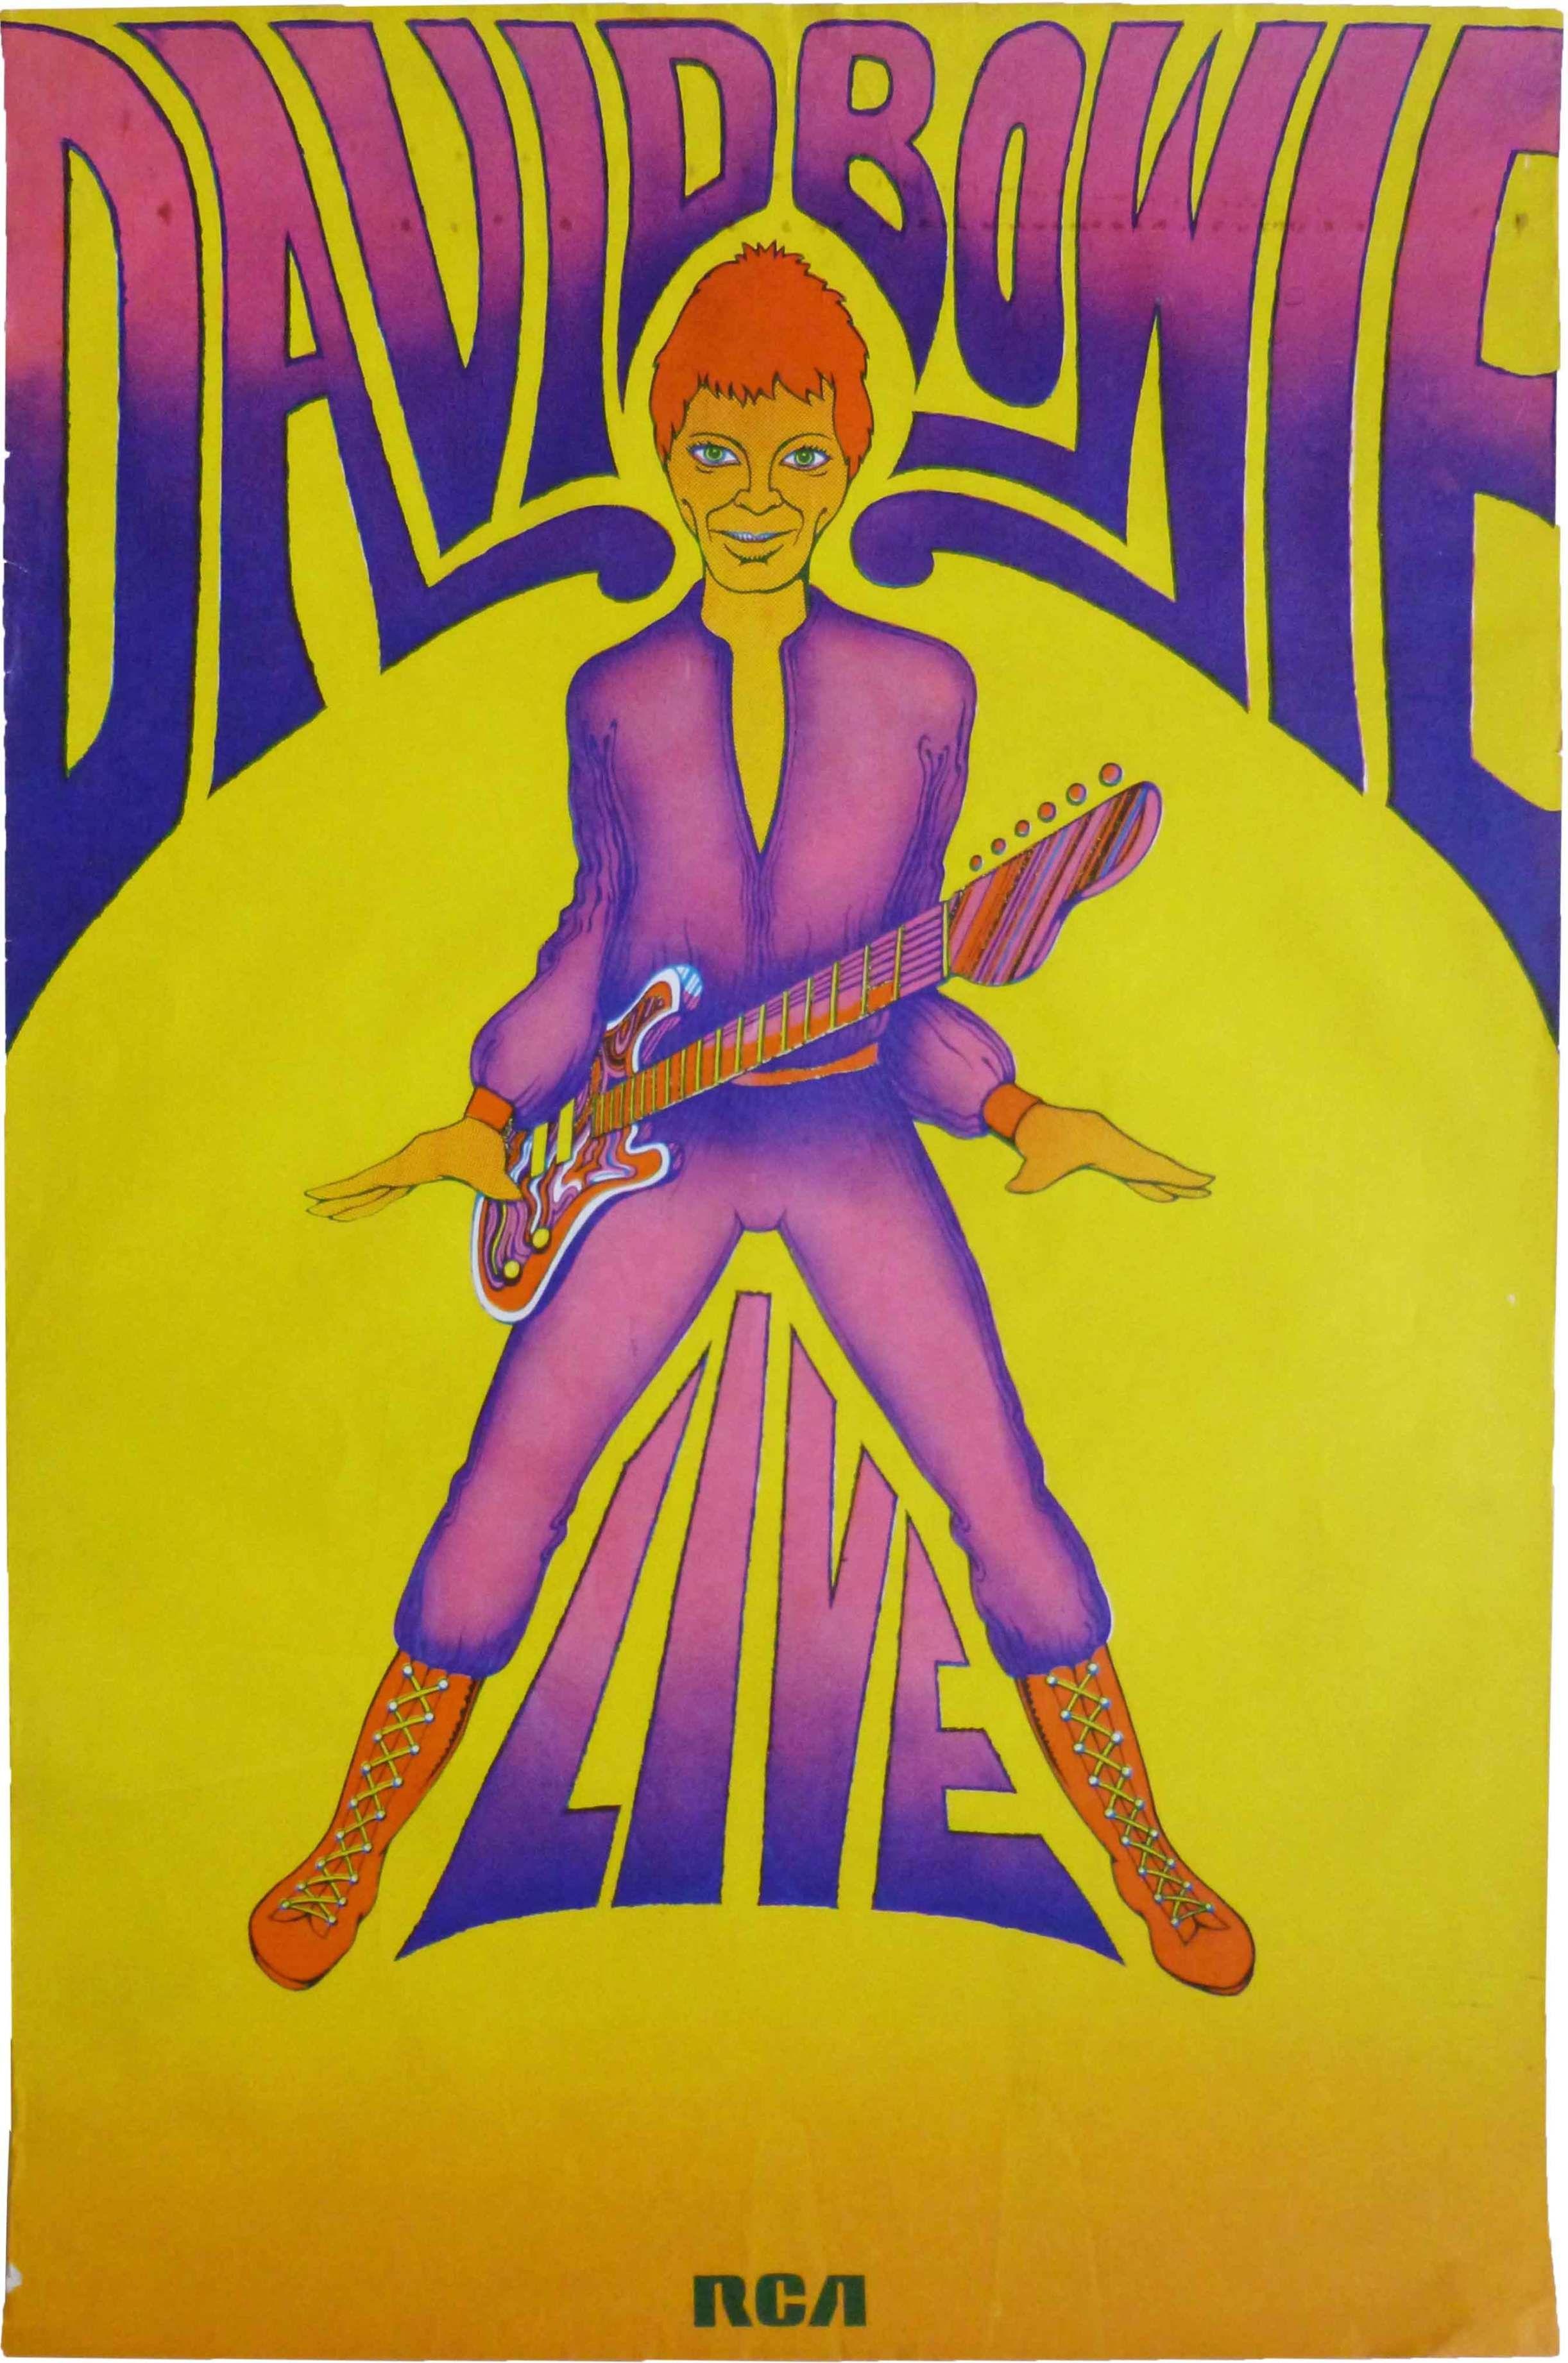 David Bowie Tour Poster George Underwood 1972 Poster David Bowie David Bowie Poster Bowie